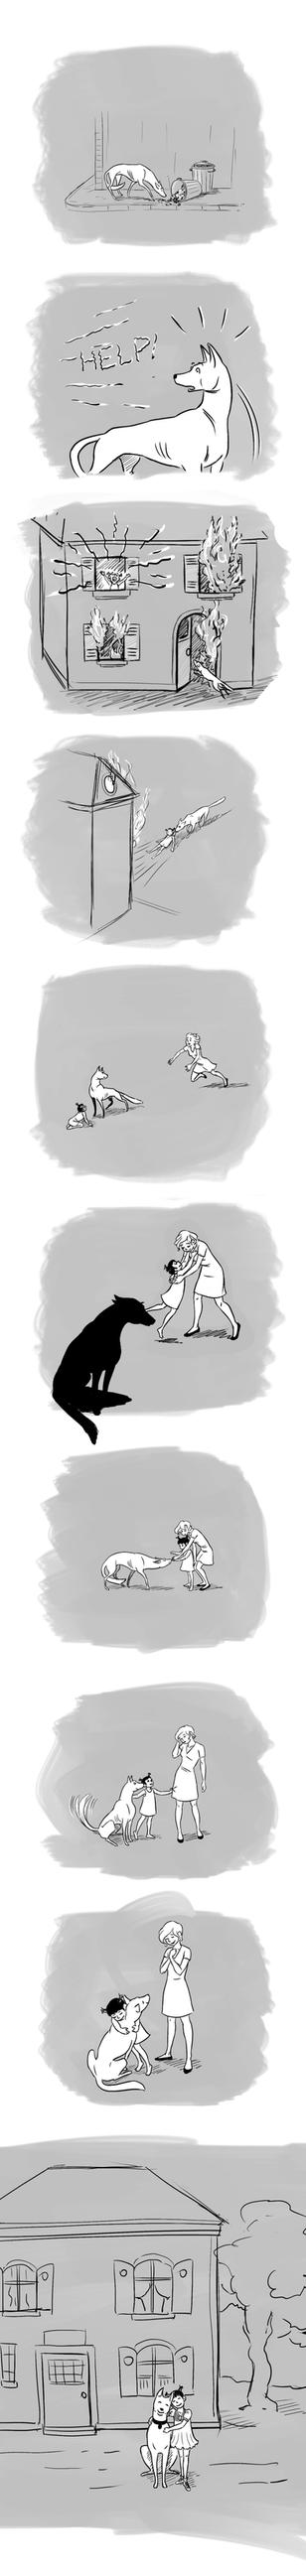 La rencontre by NorethNo